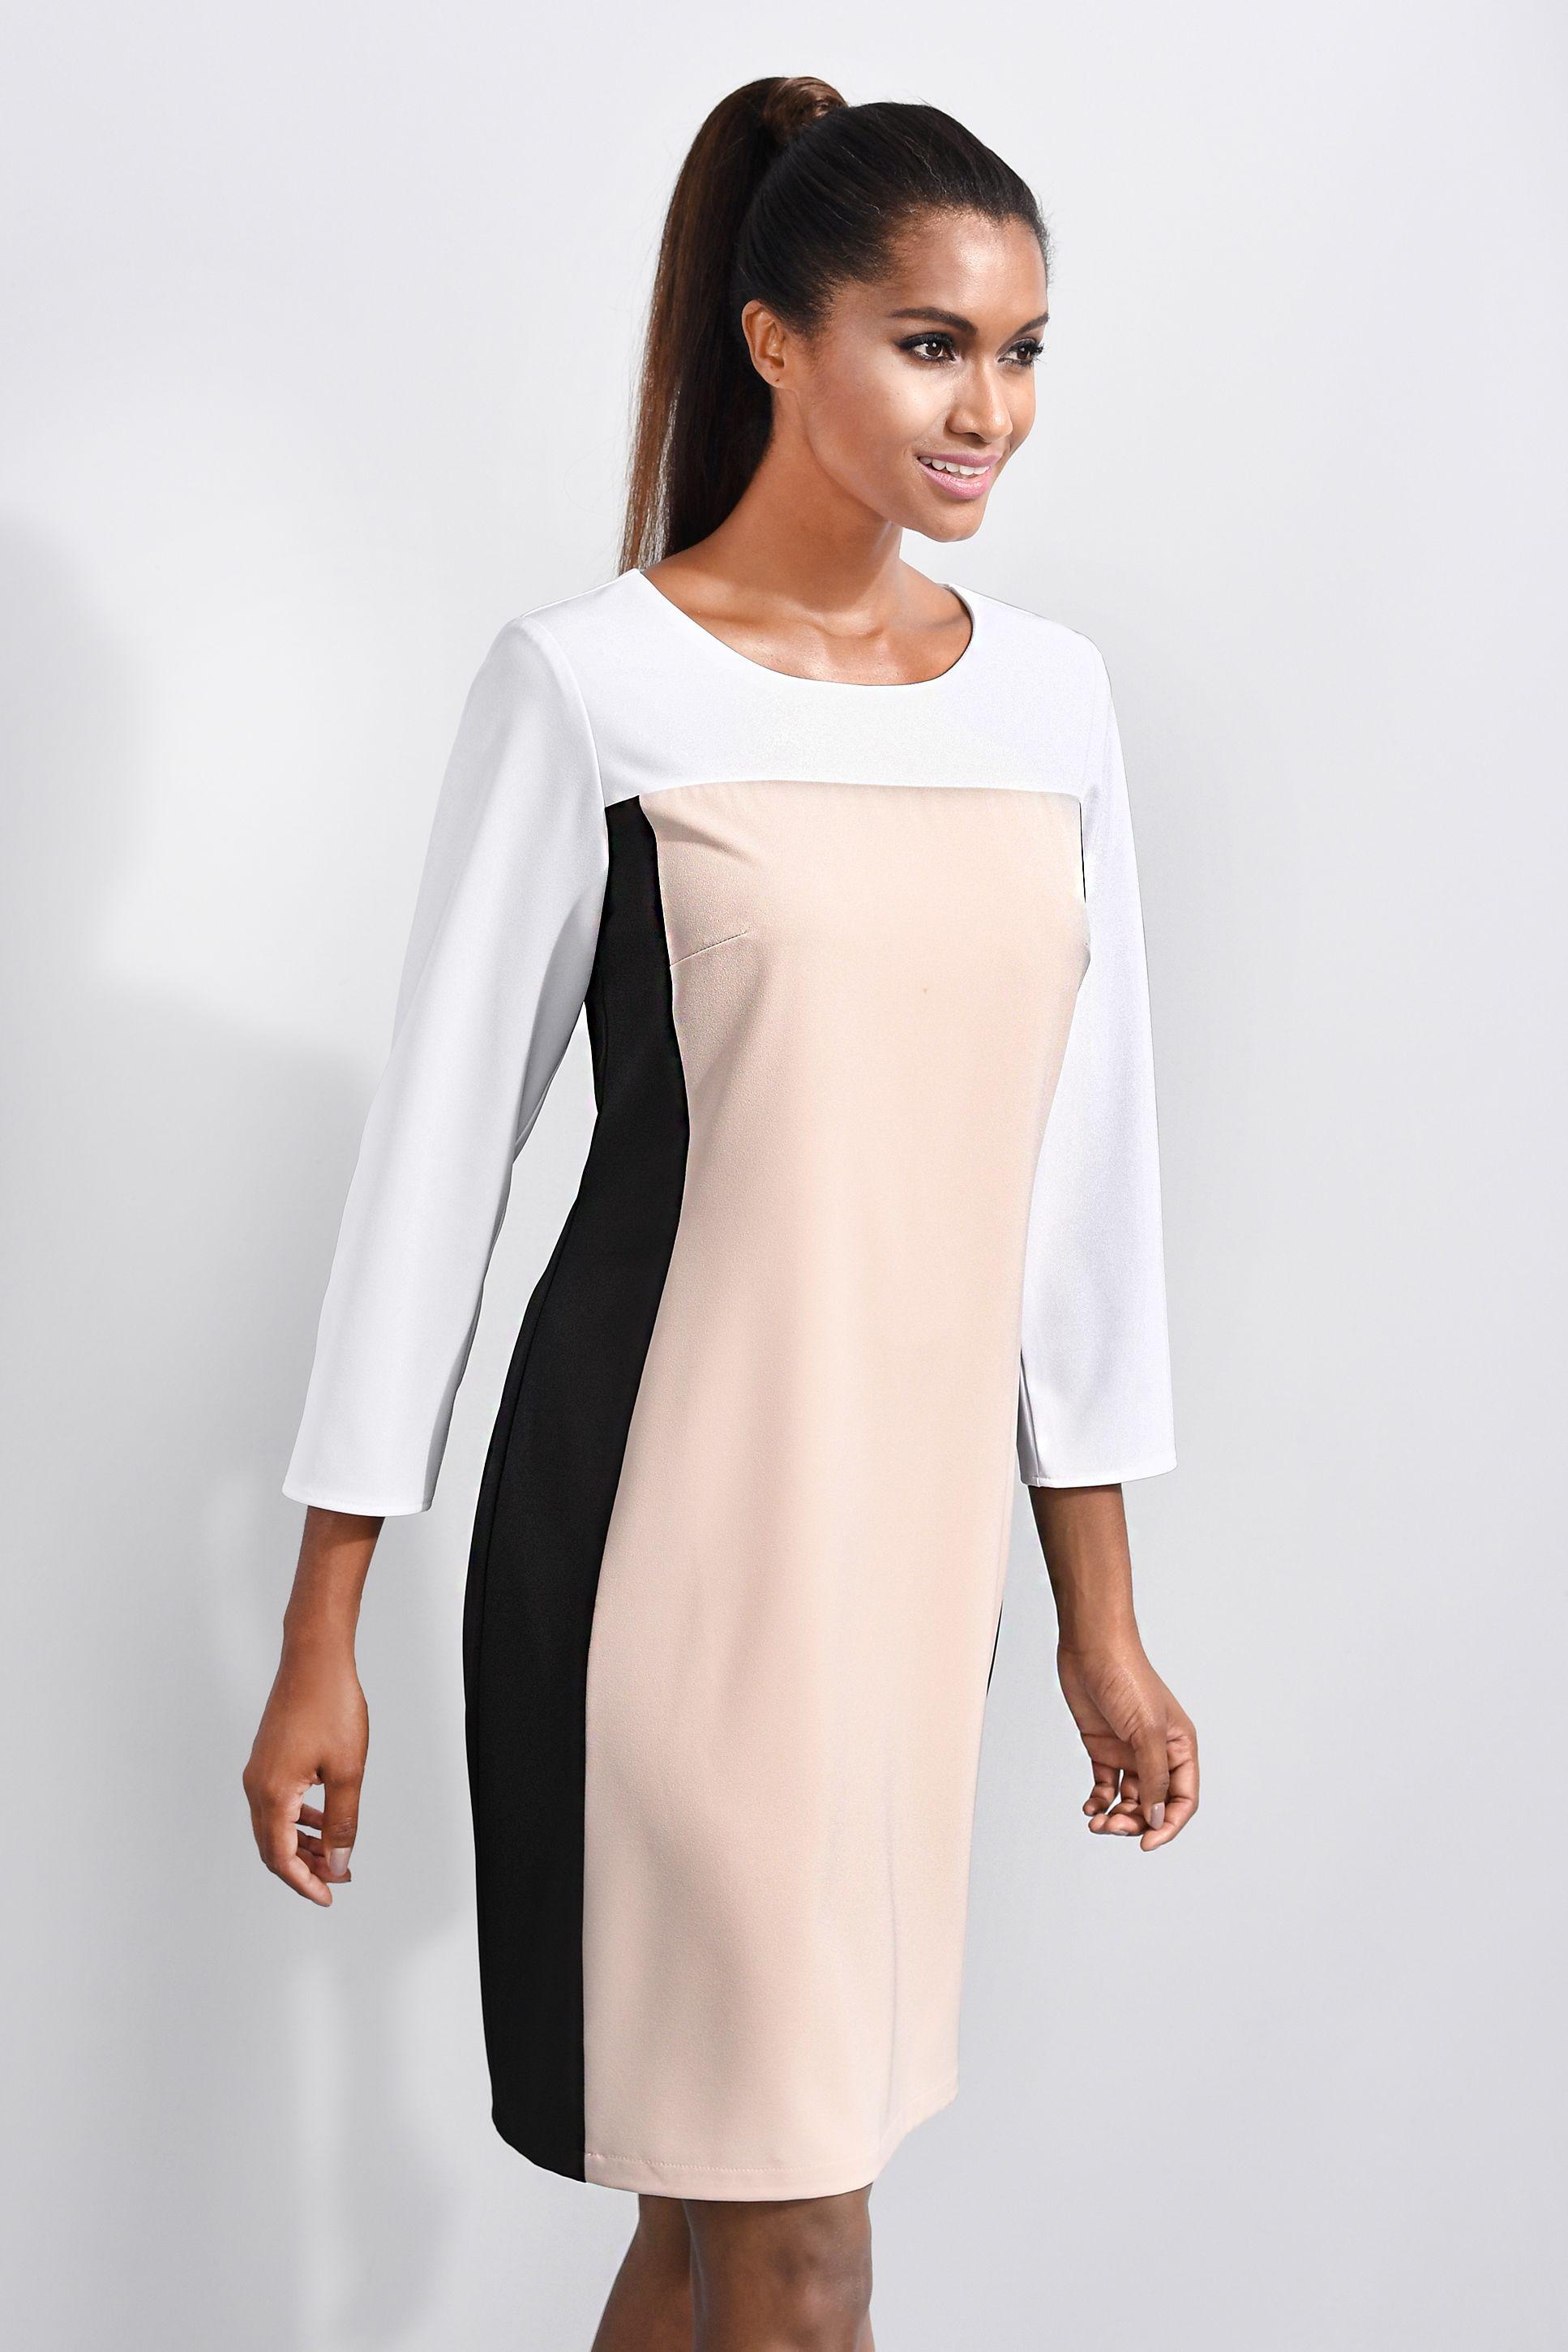 edles alba moda kleid in kurzer form, mit plakativen colour